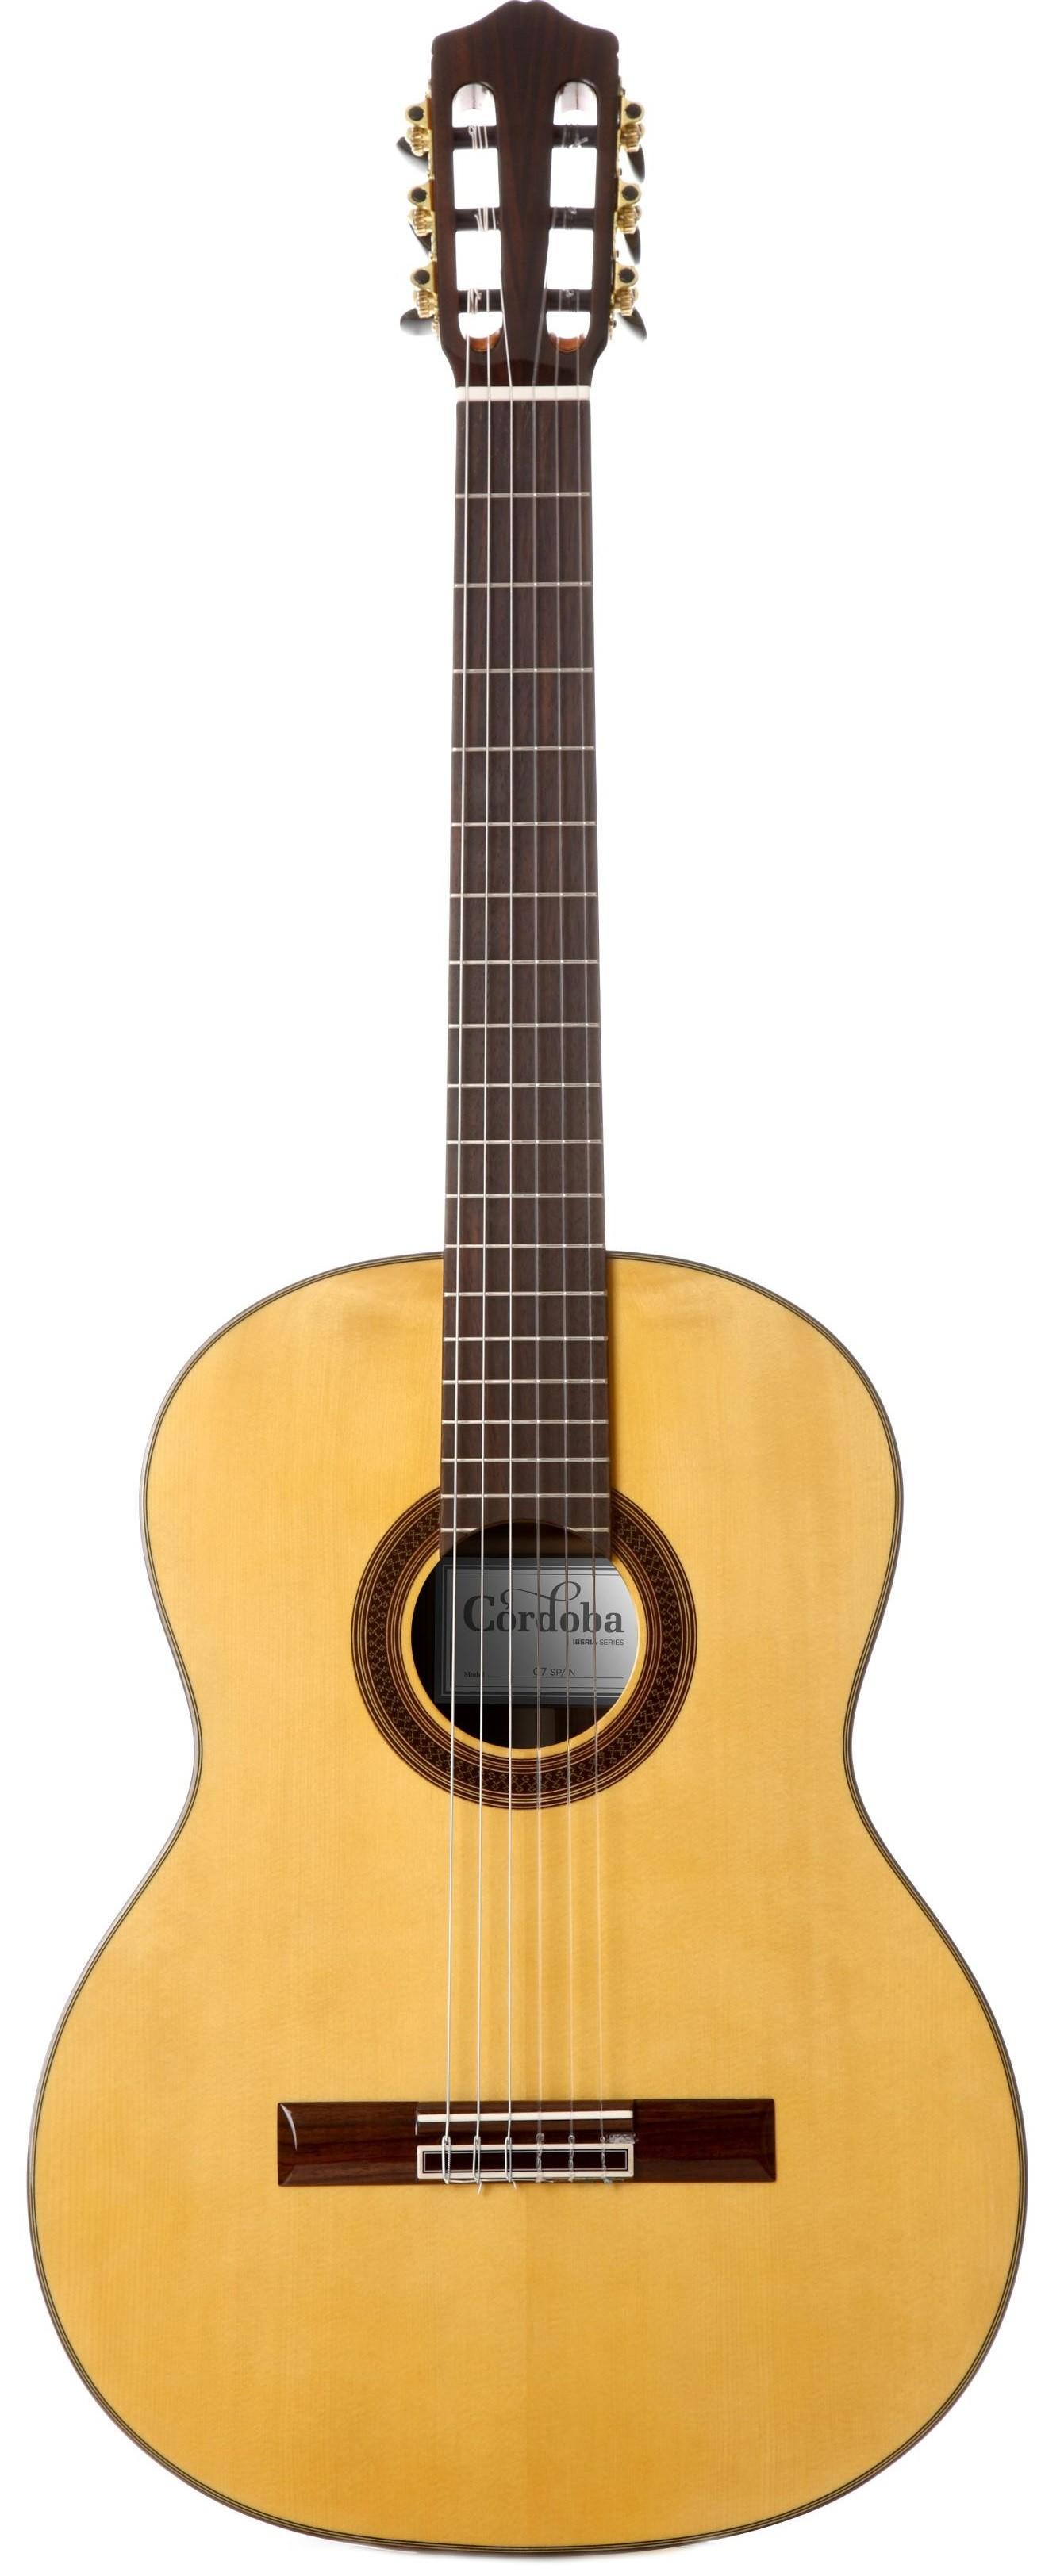 Акустическая гитара Cordoba Iberia C7 S…